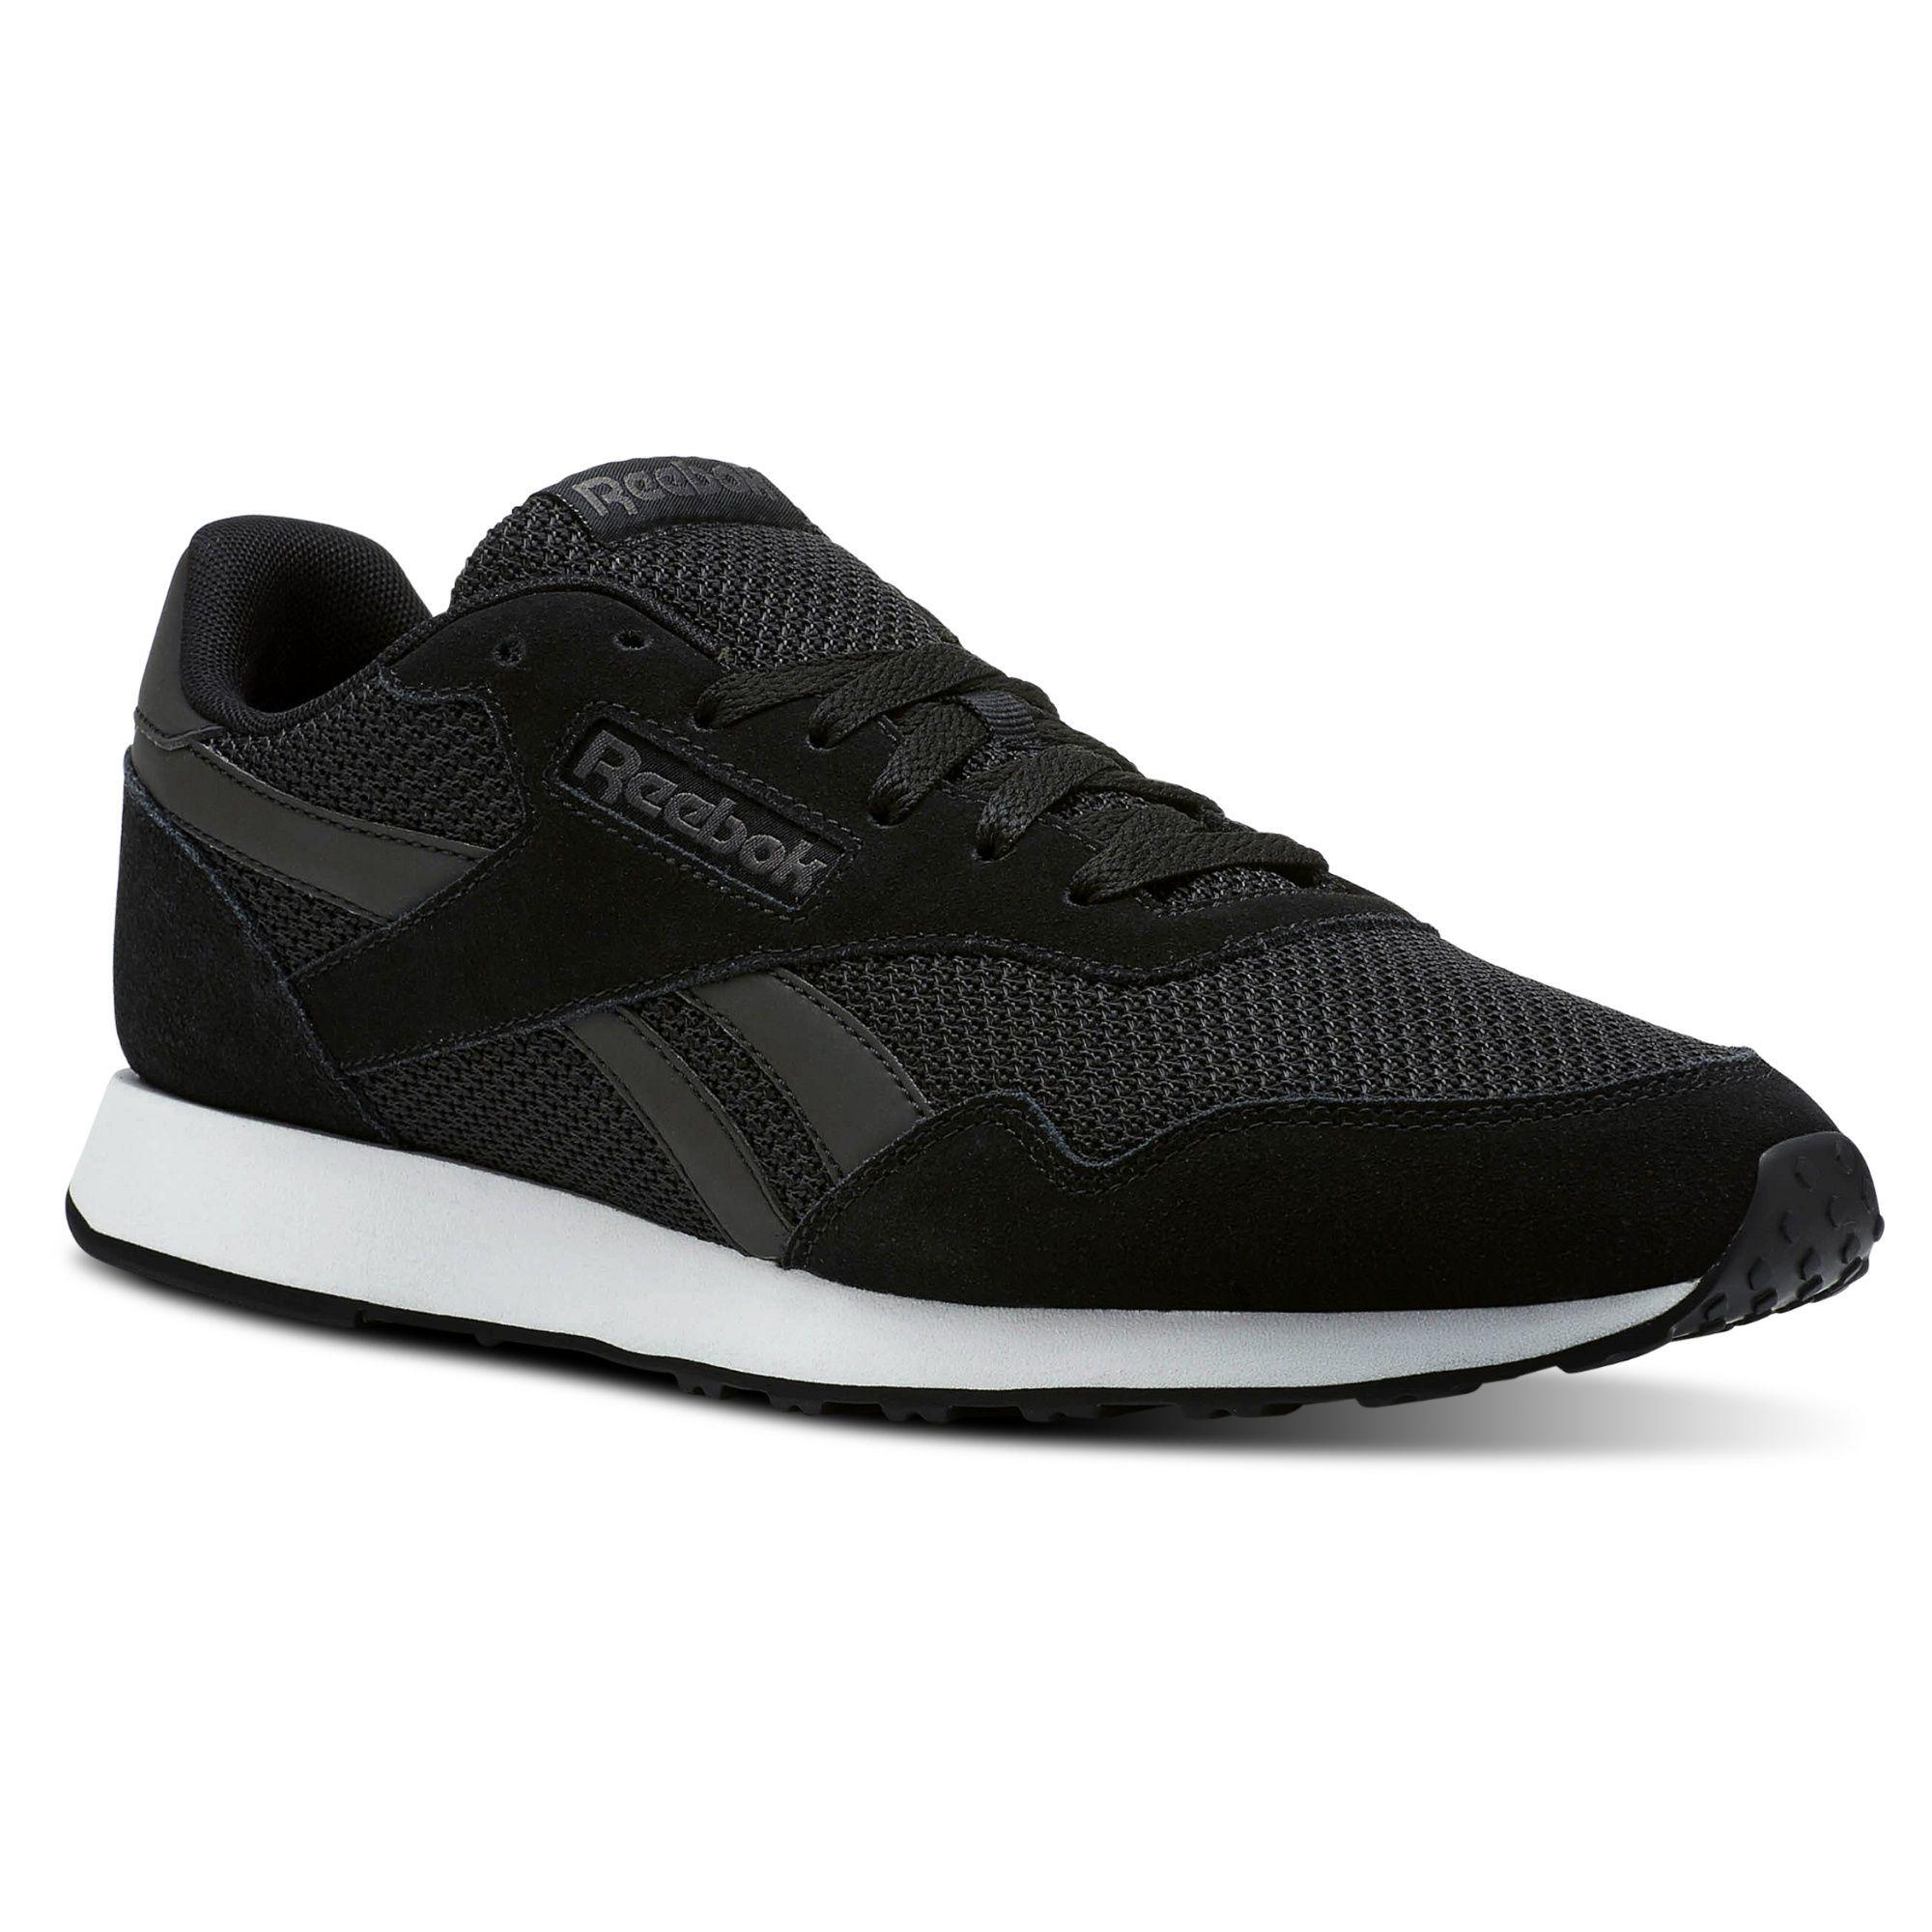 prosa Profesor mosaico  Tenis M Reebok Royal Ultra - Preto adidas | Reebok Brasil | Moda sneakers,  Sapatilhas, Reebok